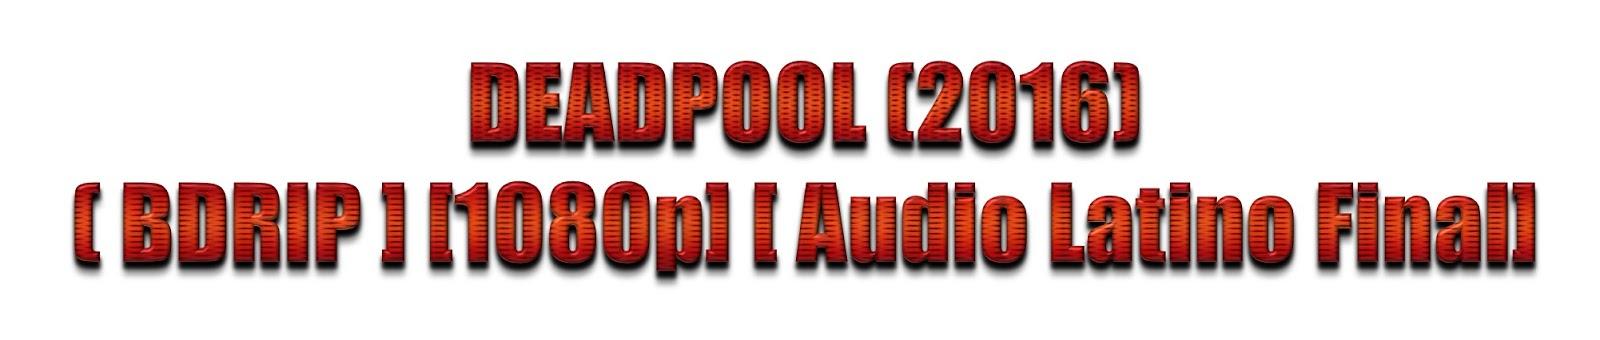 Deadpool (2016) 1080P Audio Latino Final